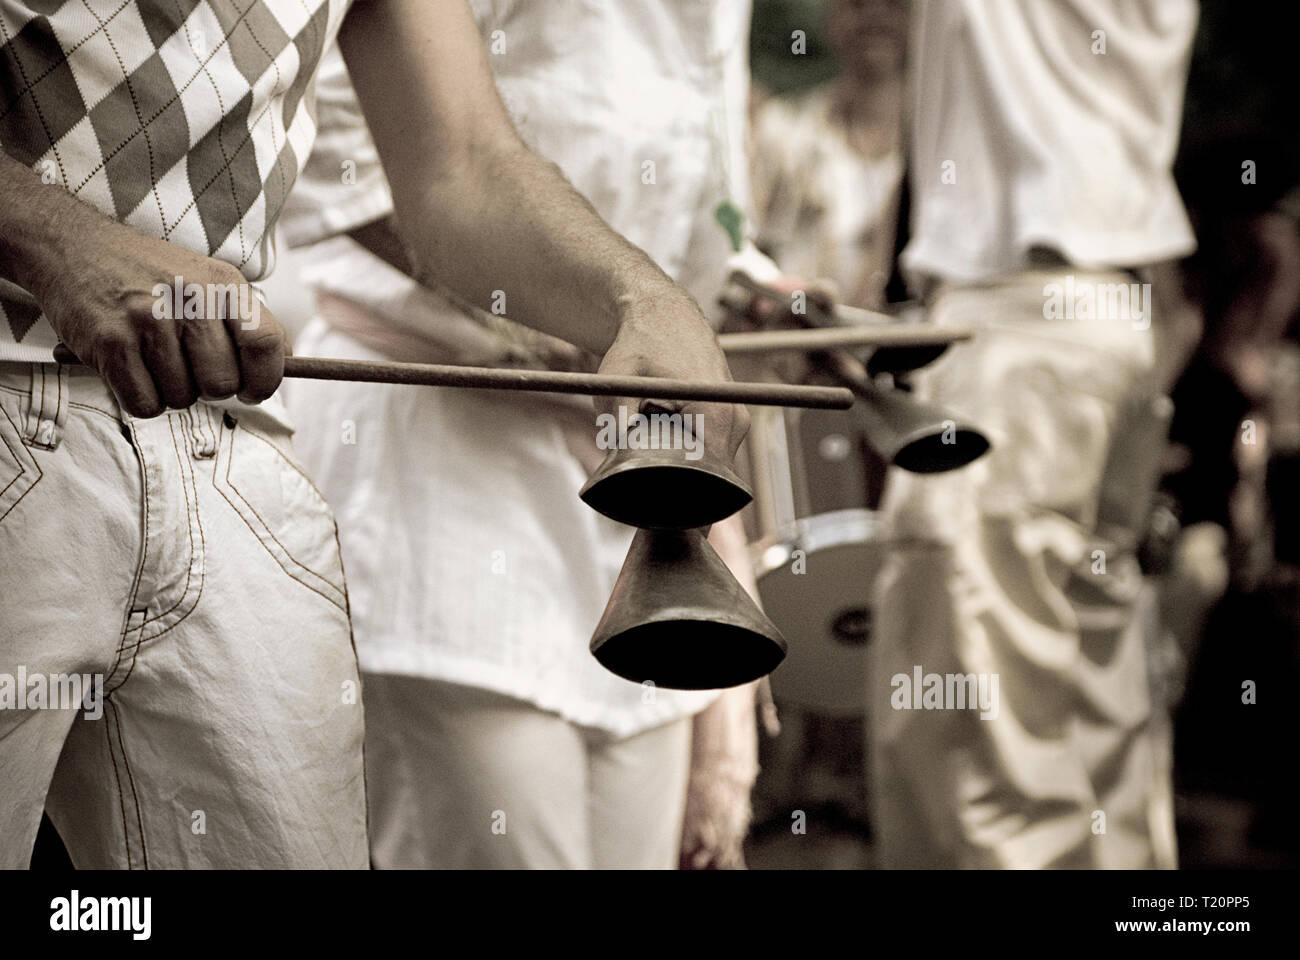 Playing brazilian percussions in Berlin - Stock Image